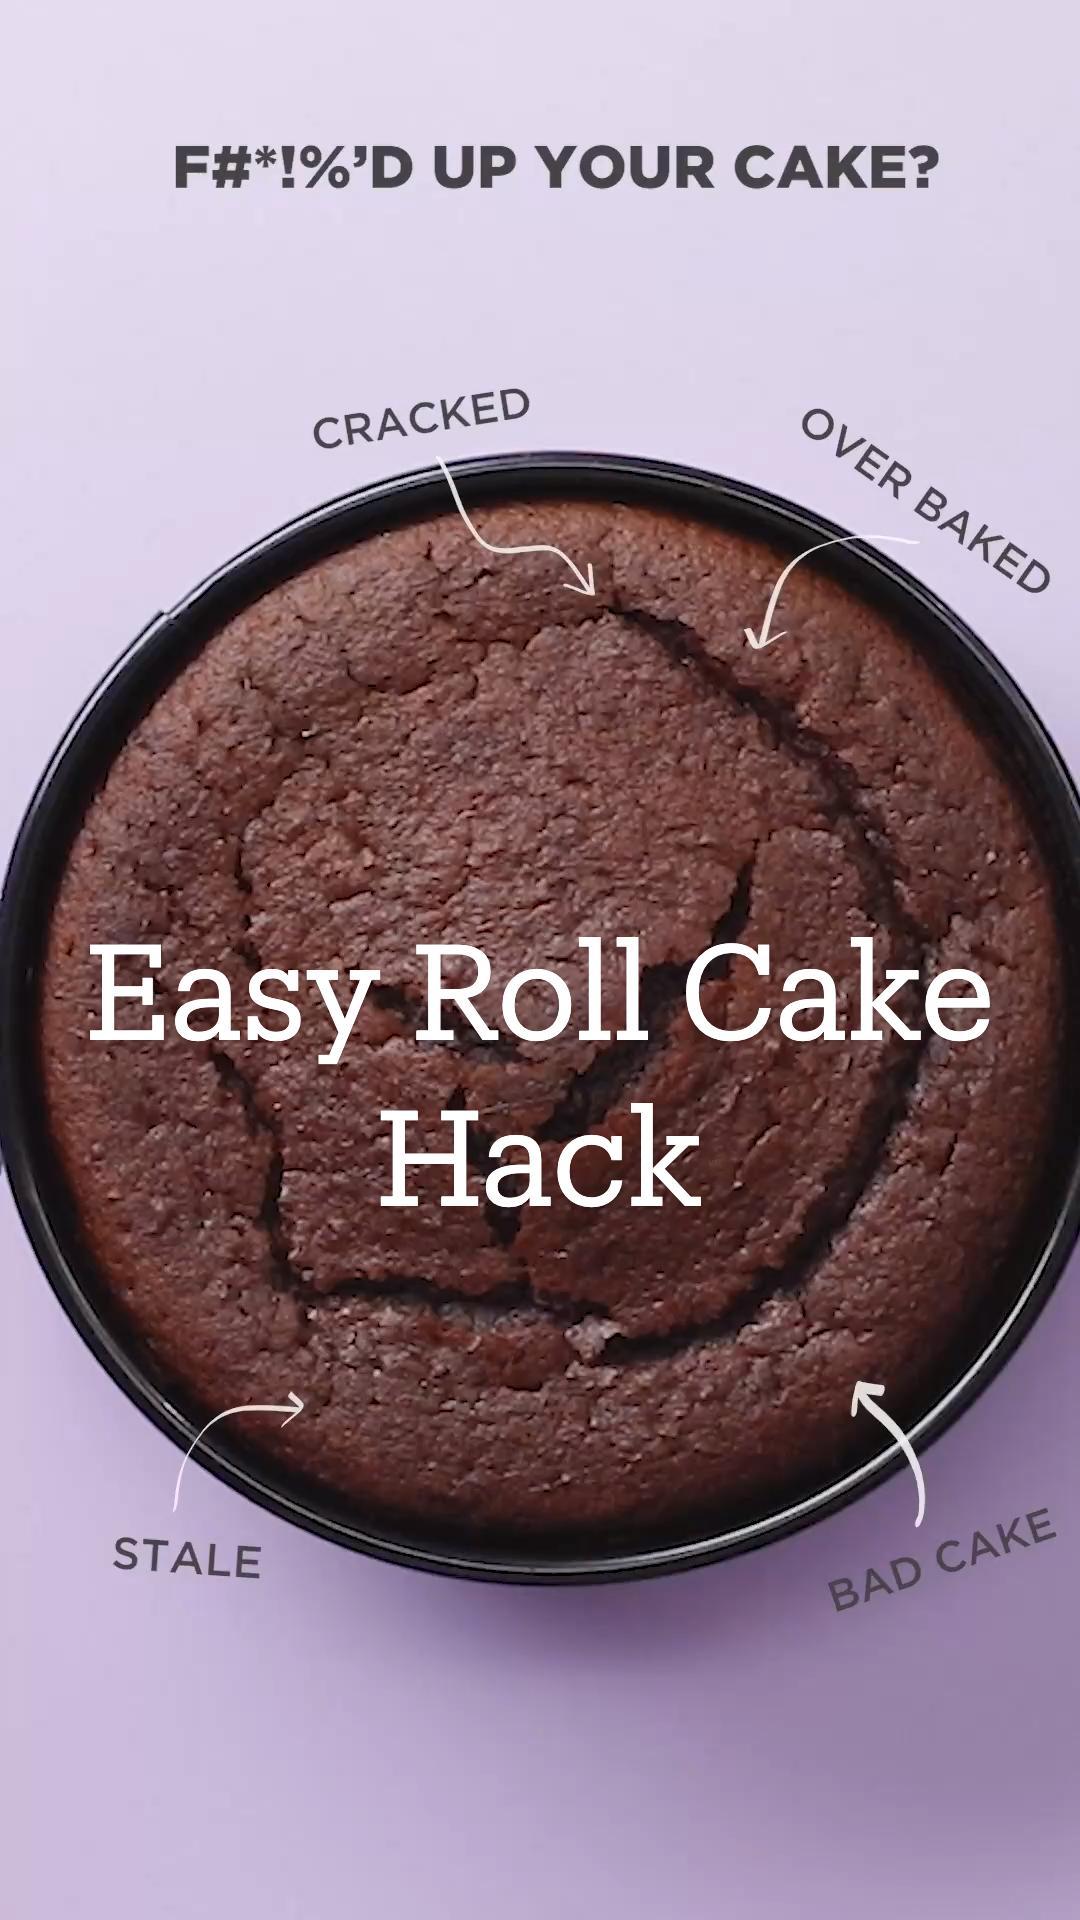 Easy Roll Cake Hack